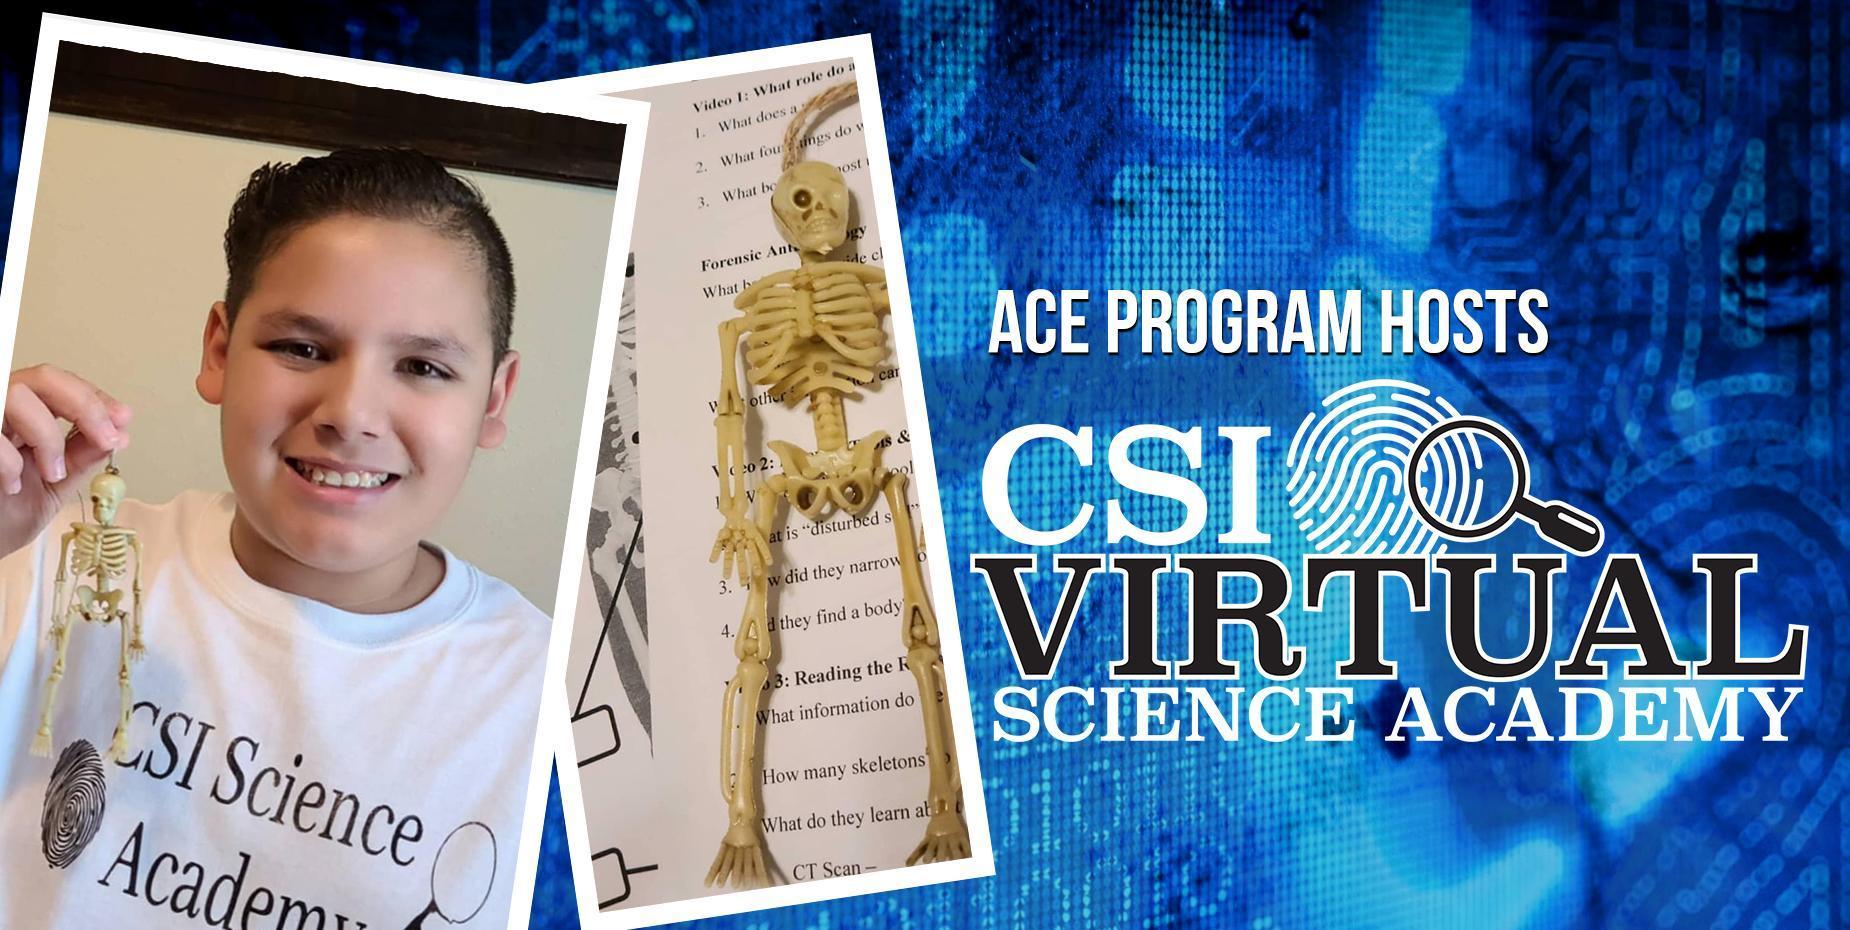 ACE program hosts CSI Science Academy